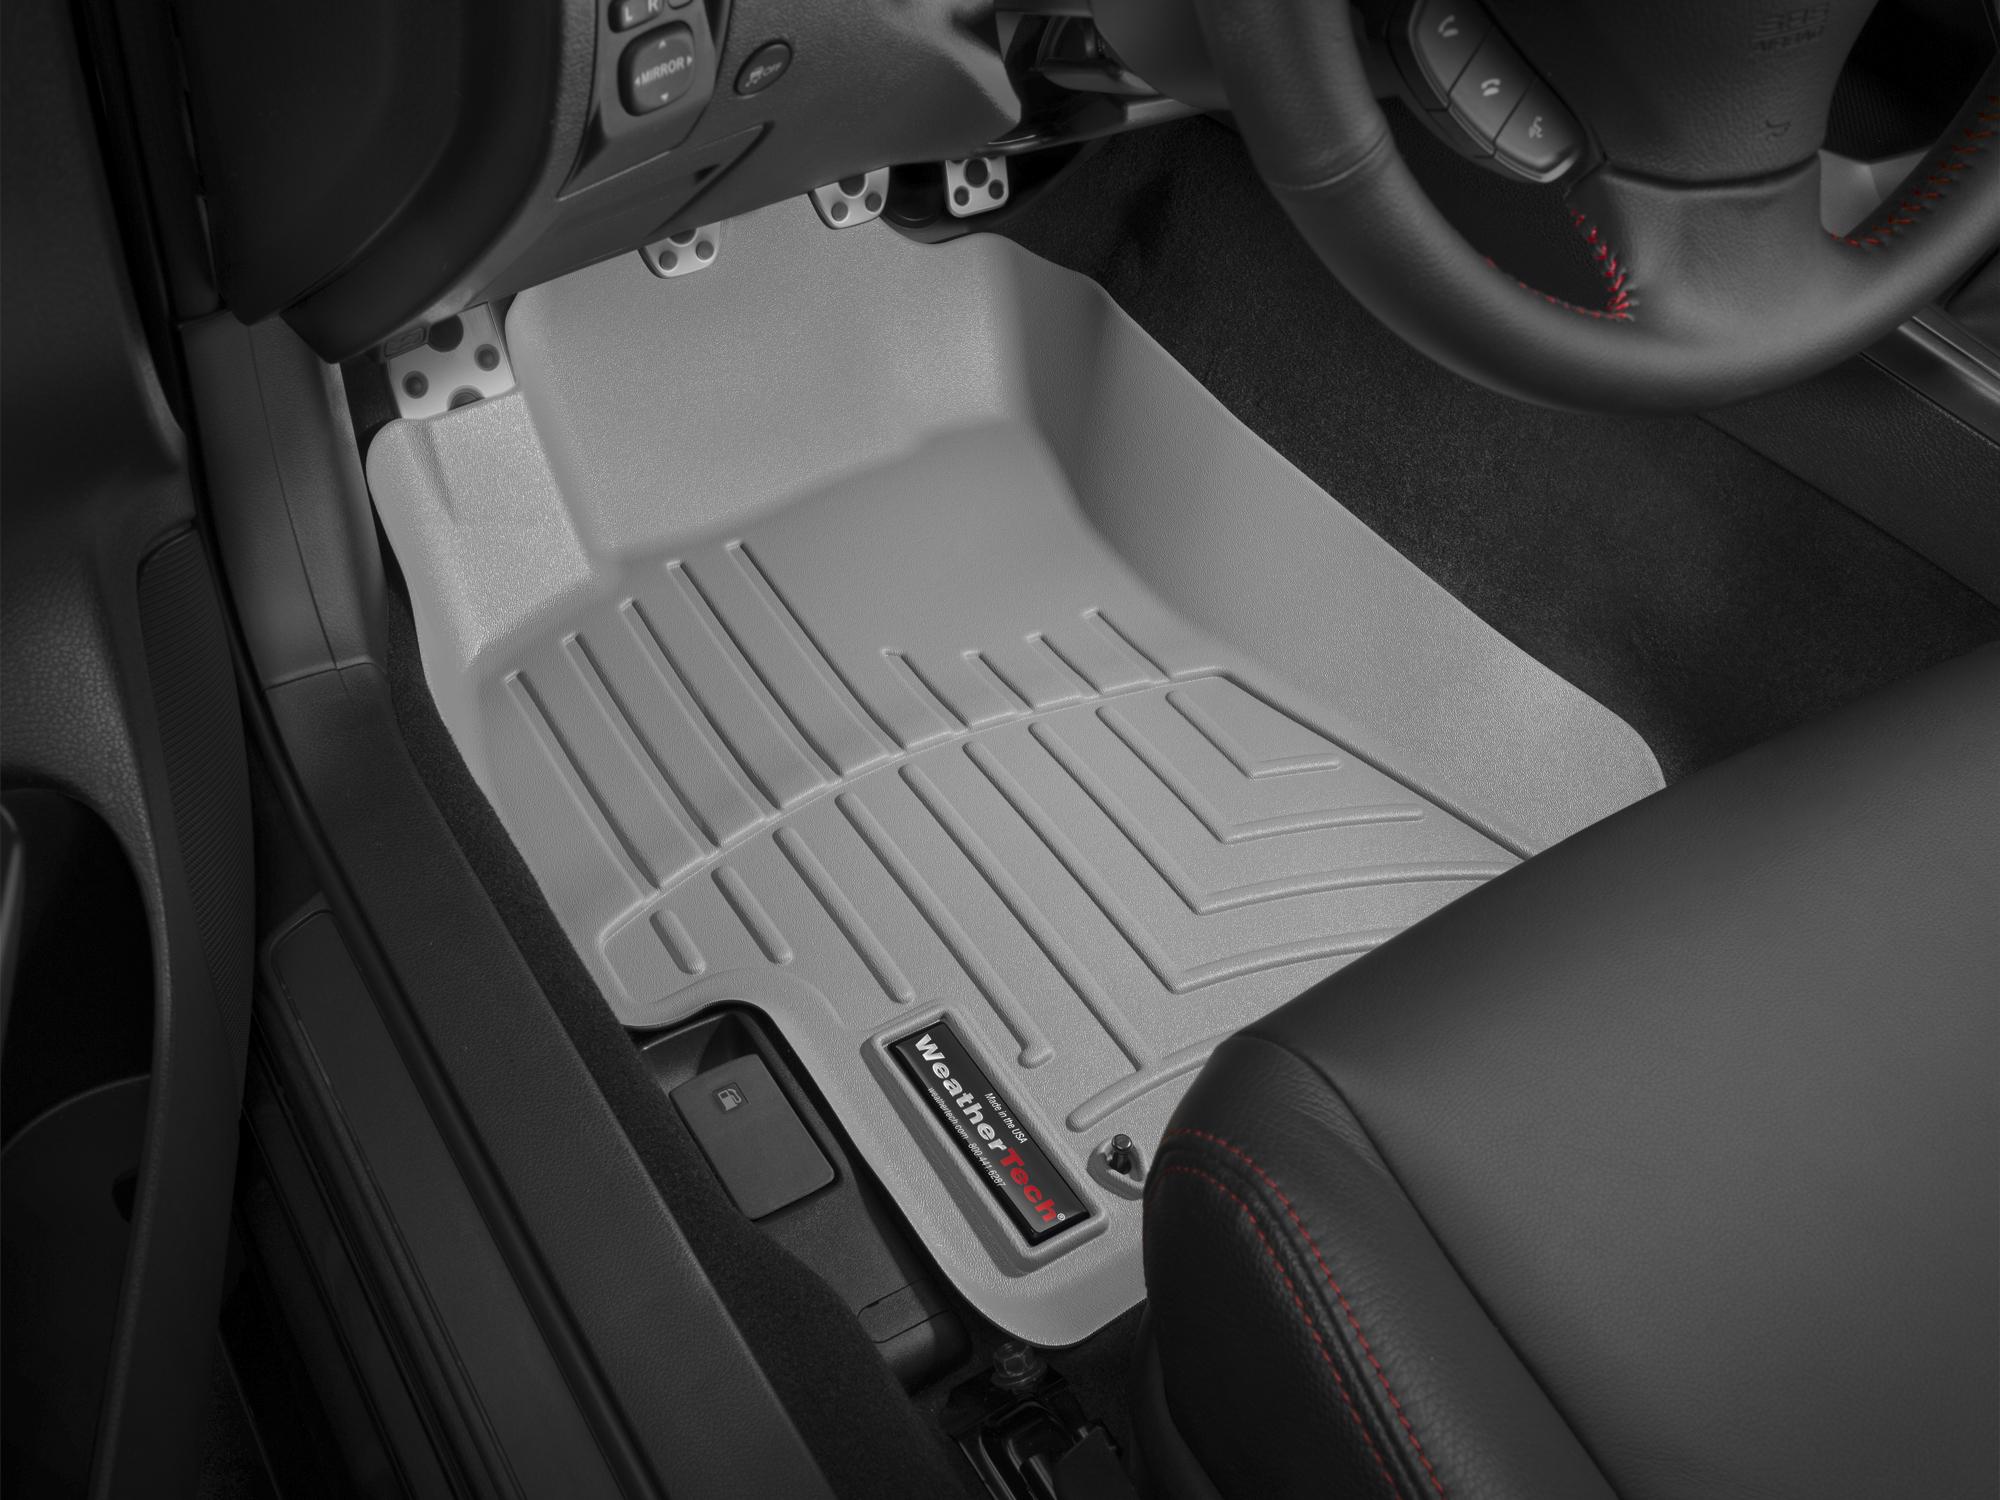 Tappeti gomma Weathertech bordo alto Subaru Impreza WRX STi 07>07 Grigio A3455